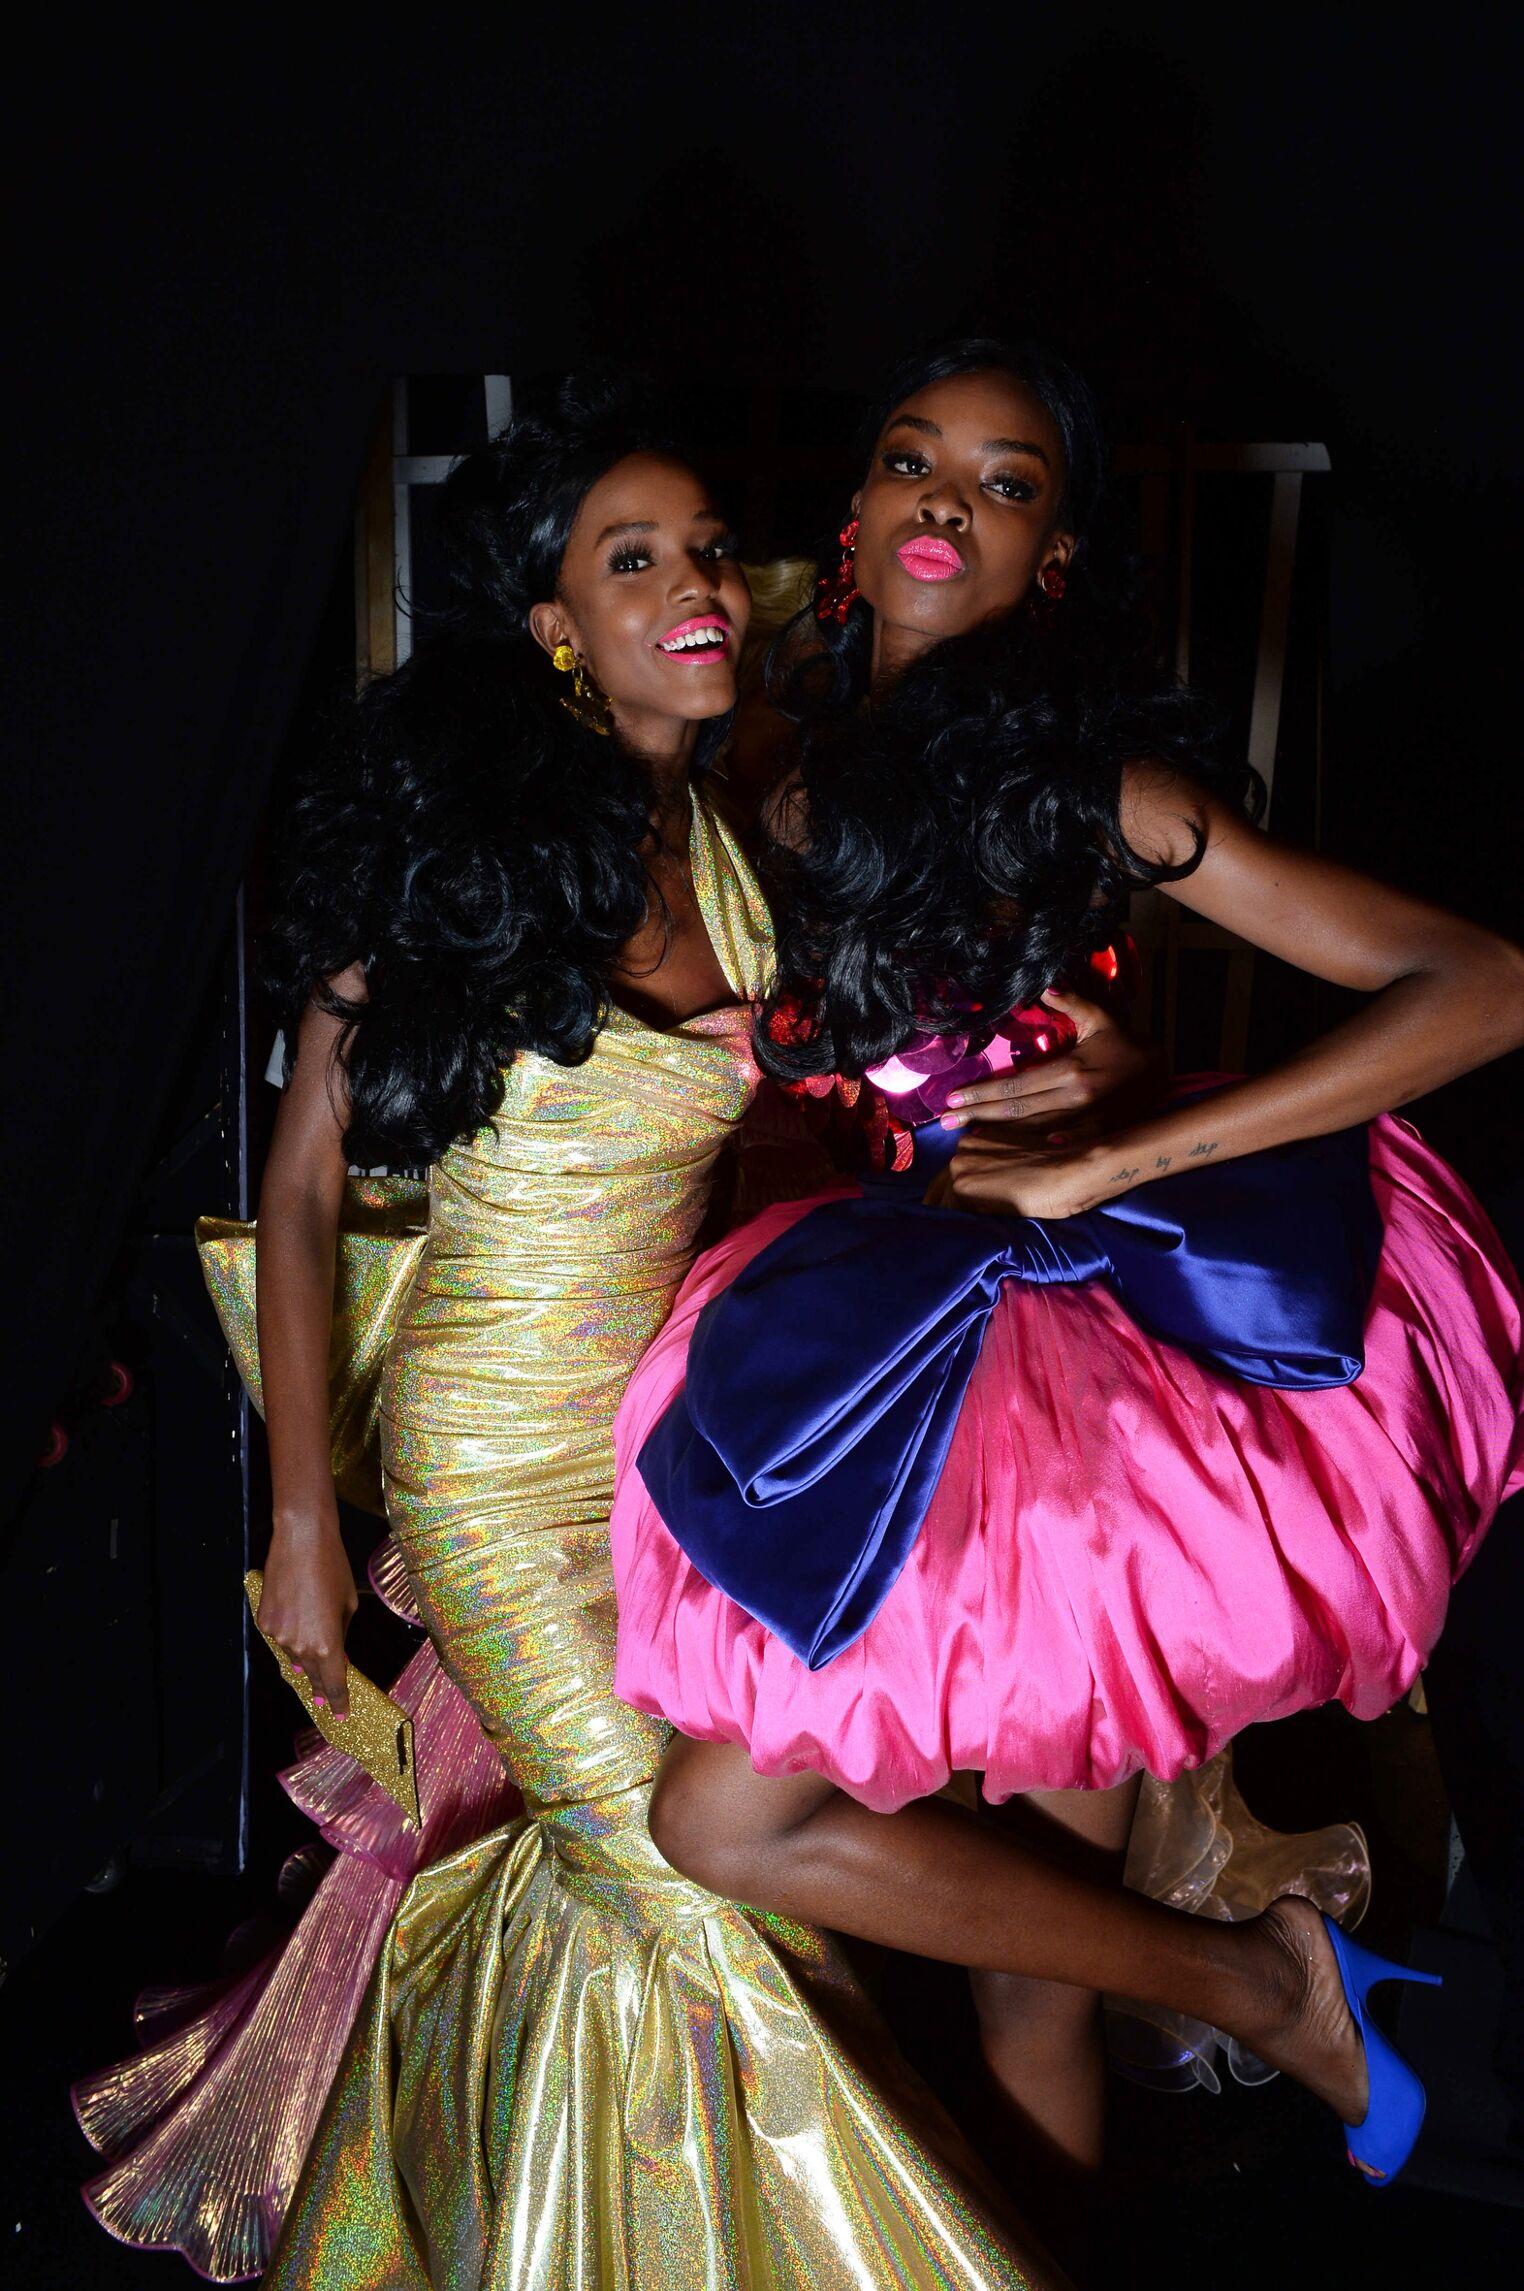 SS 2015 Moschino Fashion Backstage